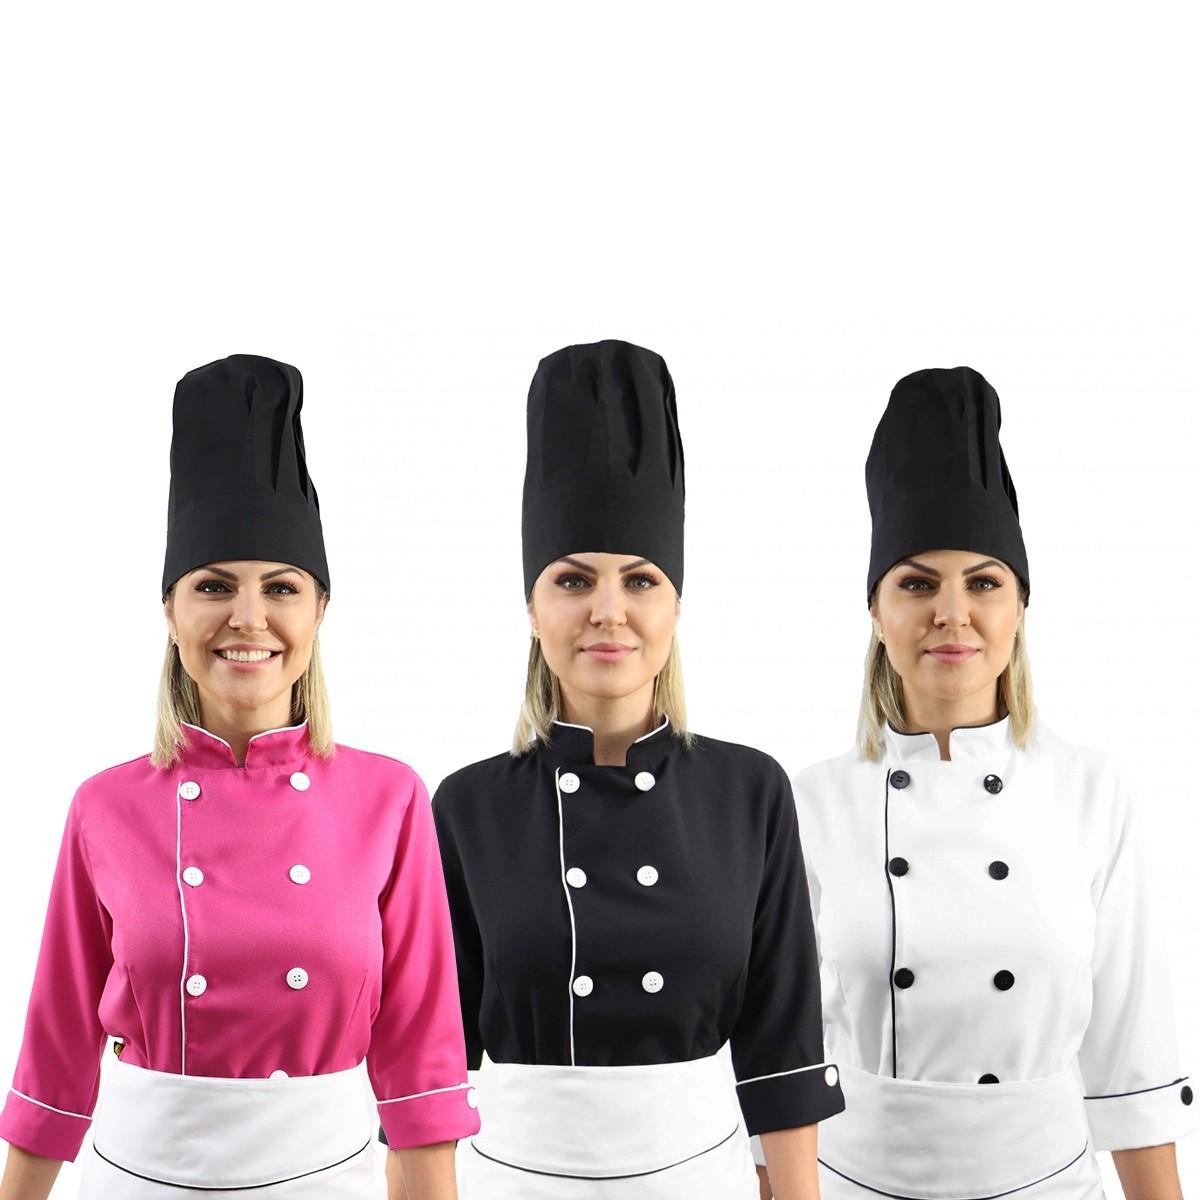 Kit chef cozinha feminino Dolmã manga 3/4 +  Avental branco + Chapéu preto